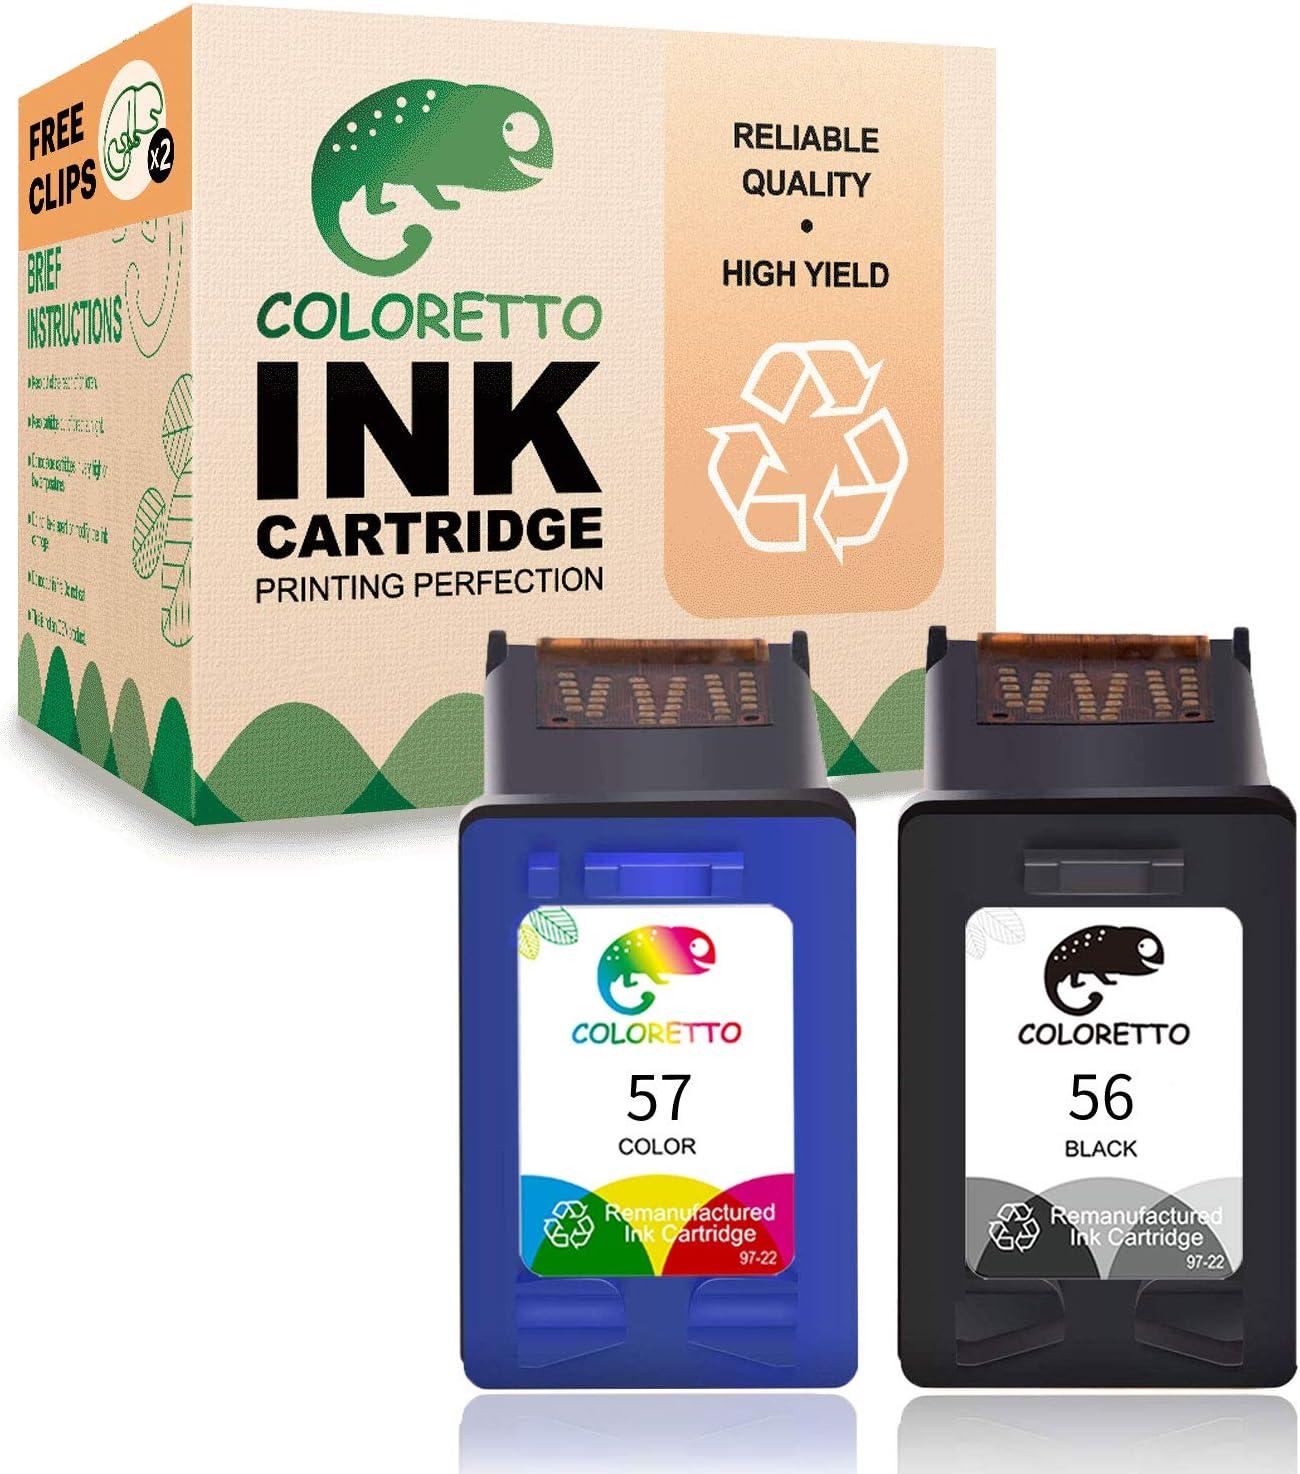 Coloretto Re-Manufactured Printer Ink Cartridge Replacement HP 56 57,Used in HP Deskjet Series: 450,450cbi,450ci,Photosmart Series: 7150, 7150v, 7155,Officejet Series: 4105 (1 Black+1 Tri-Color